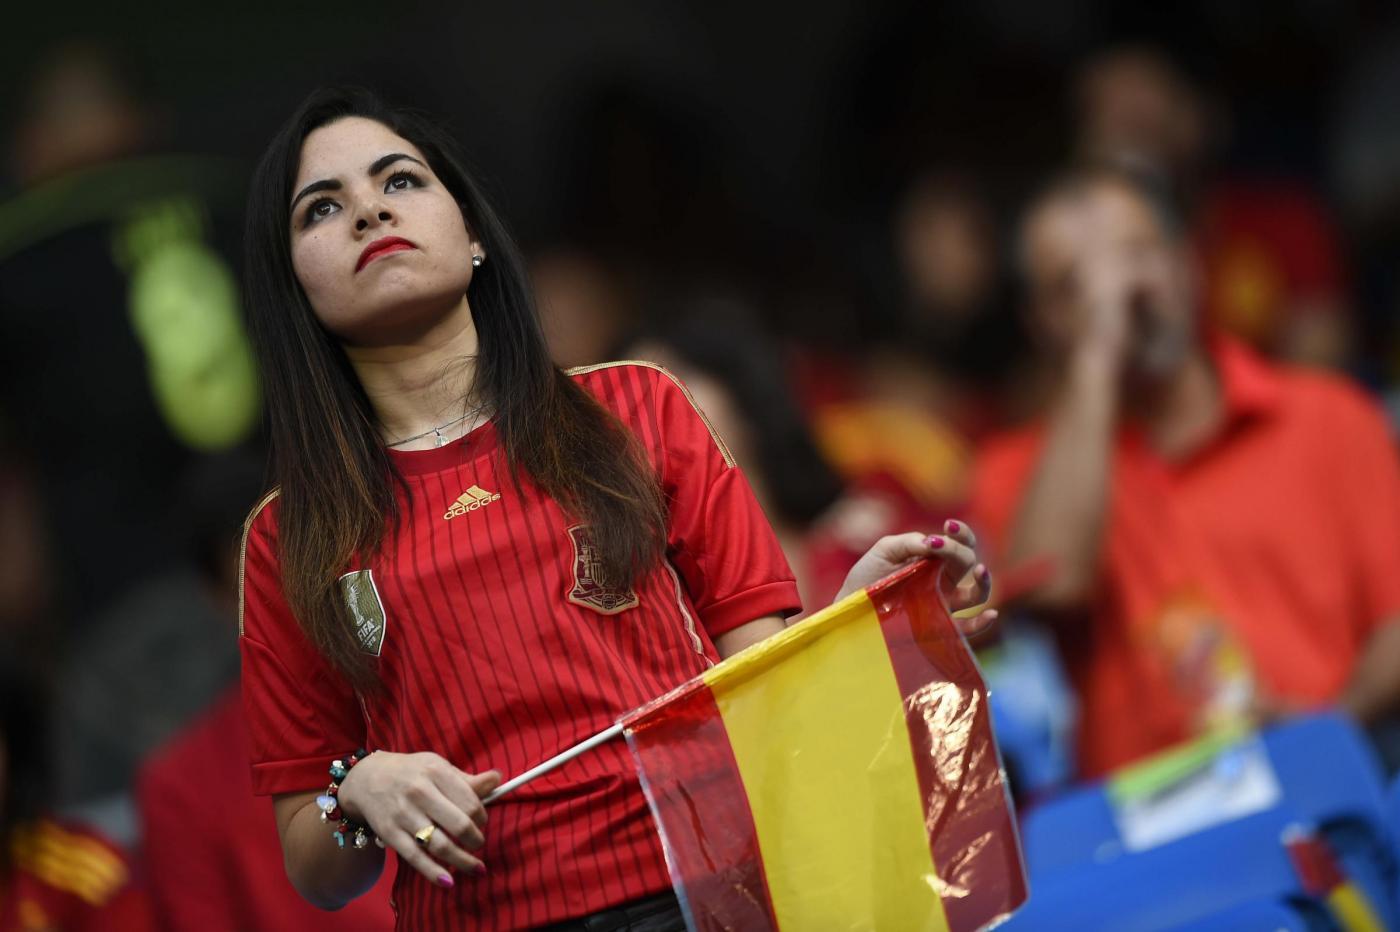 Copa Federacion Spagna 9 ottobre: i pronostici